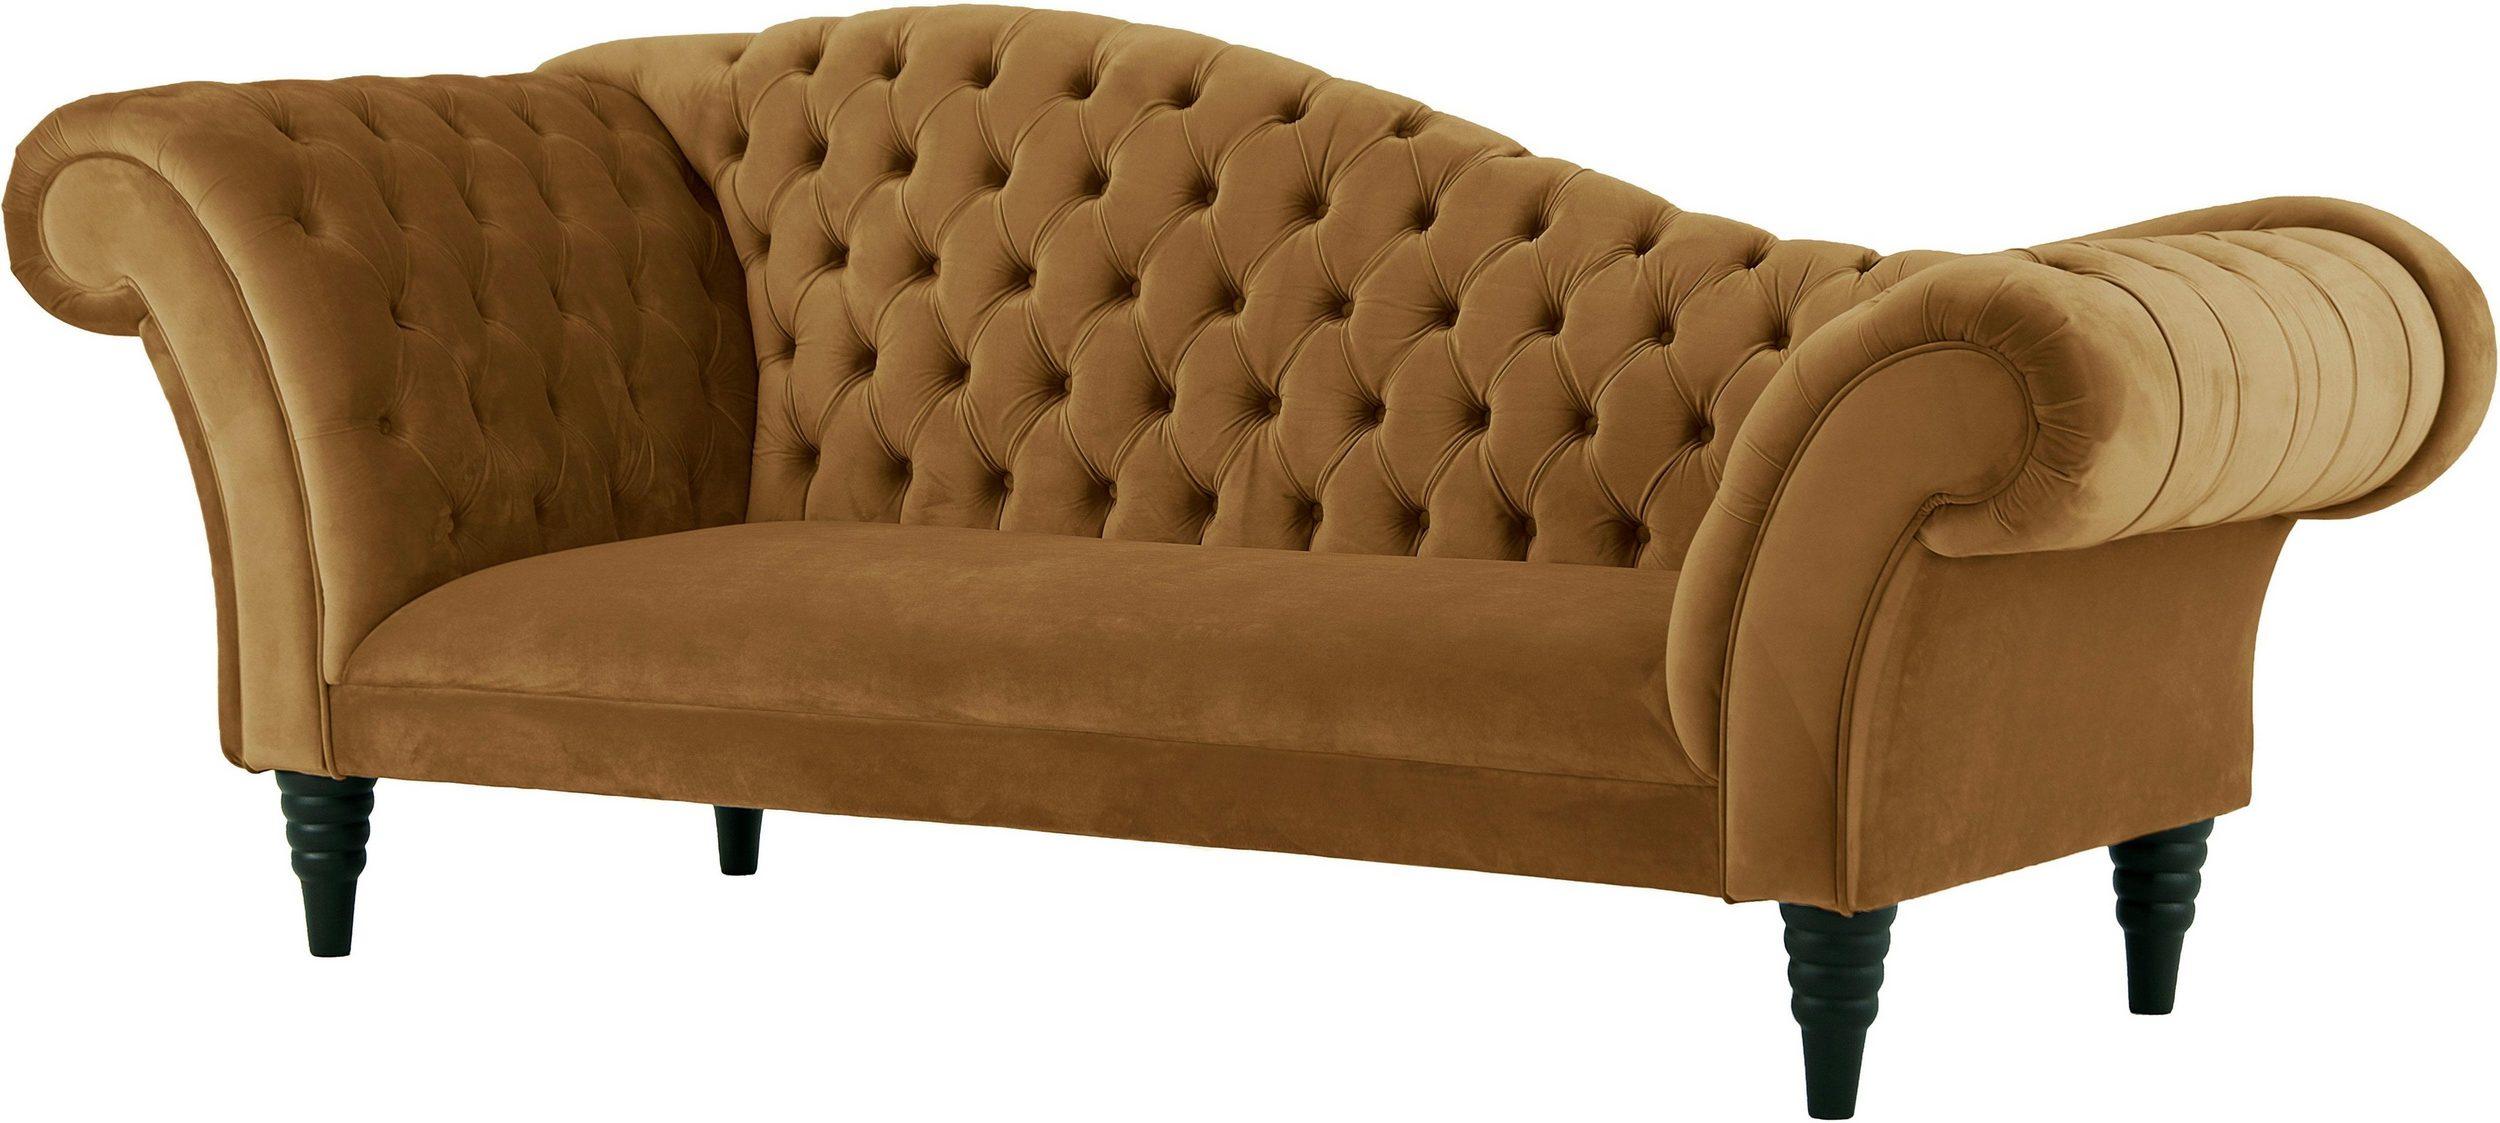 3-Sitzer Chesterfield Sofa Recamiere